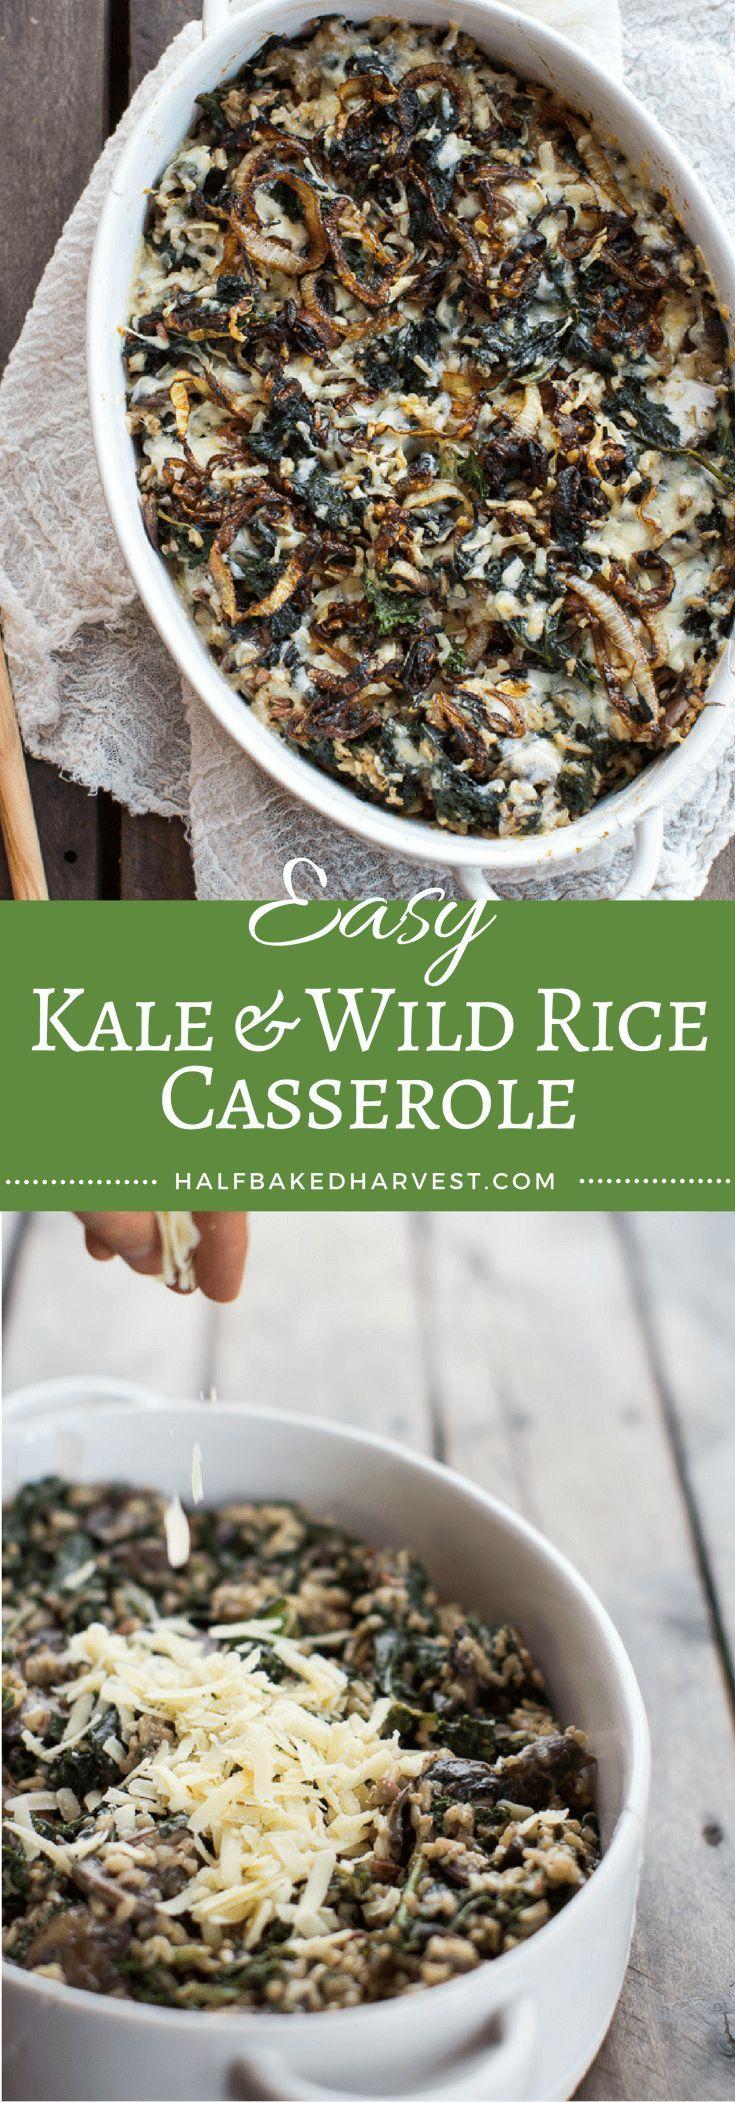 Kale and Wild Rice Casserole | http://halfbakedharvest.com /hbharvest/